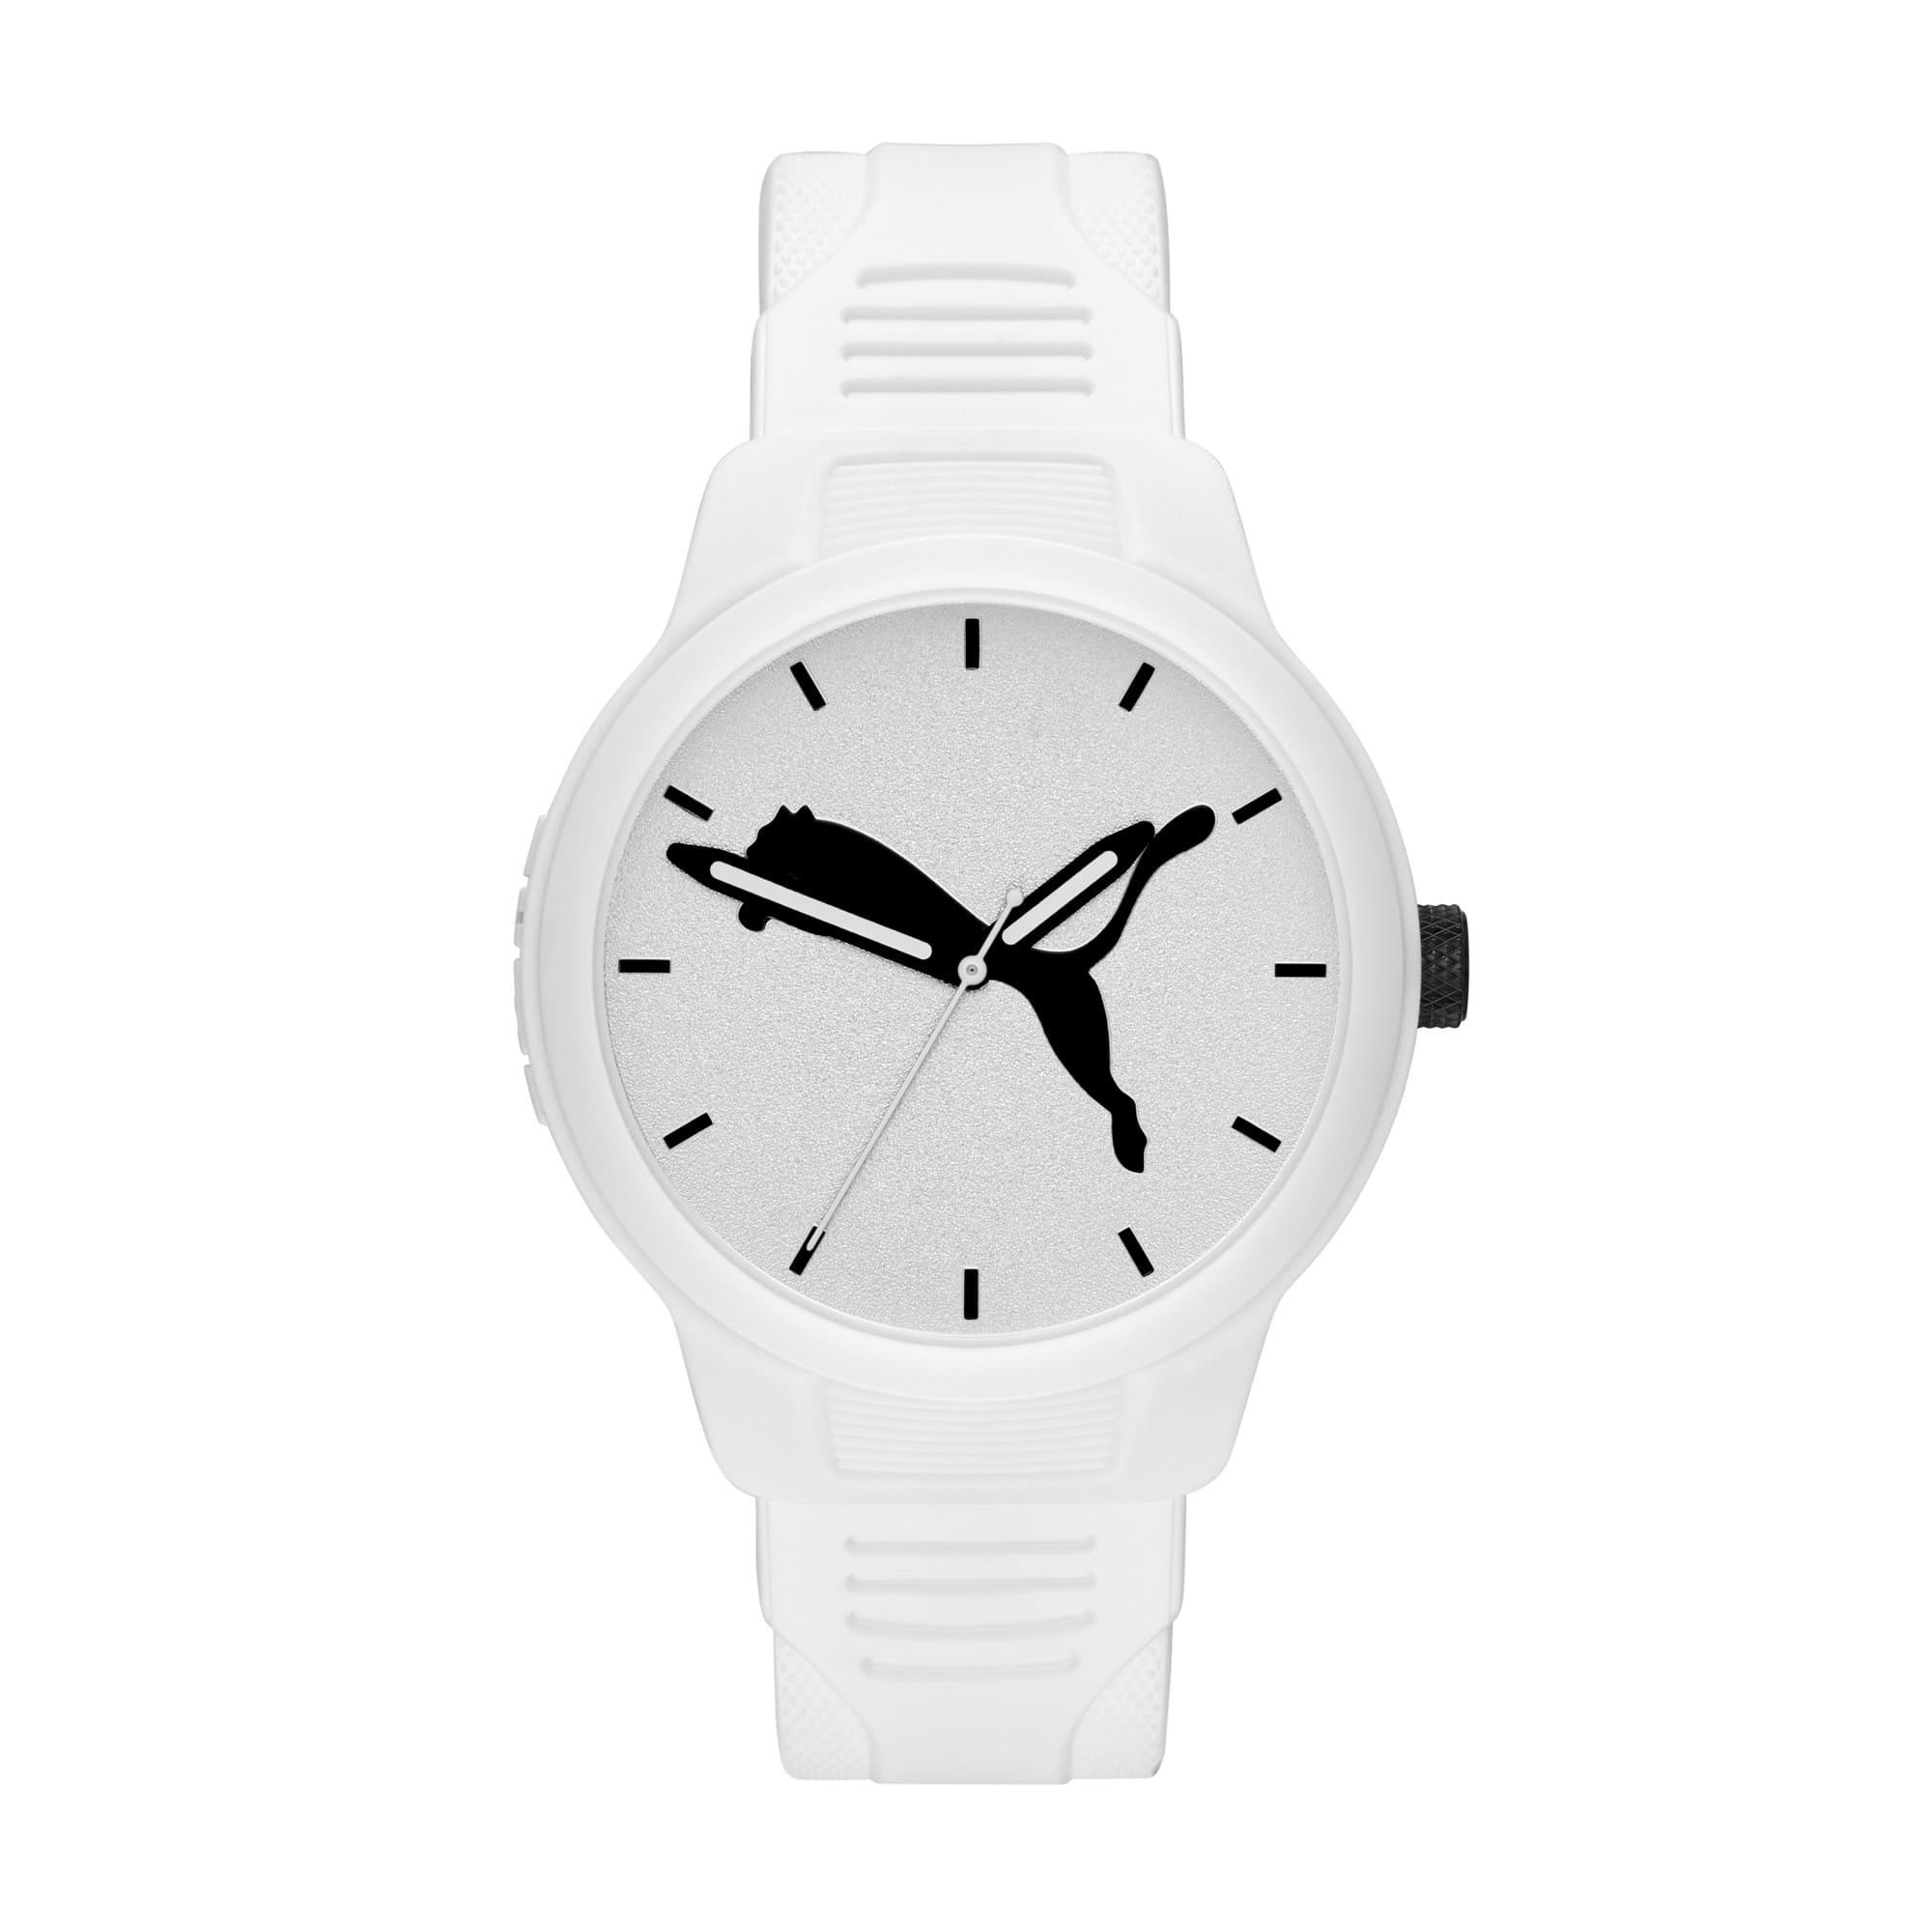 Thumbnail 1 of Reset v2 Watch, White/White, medium